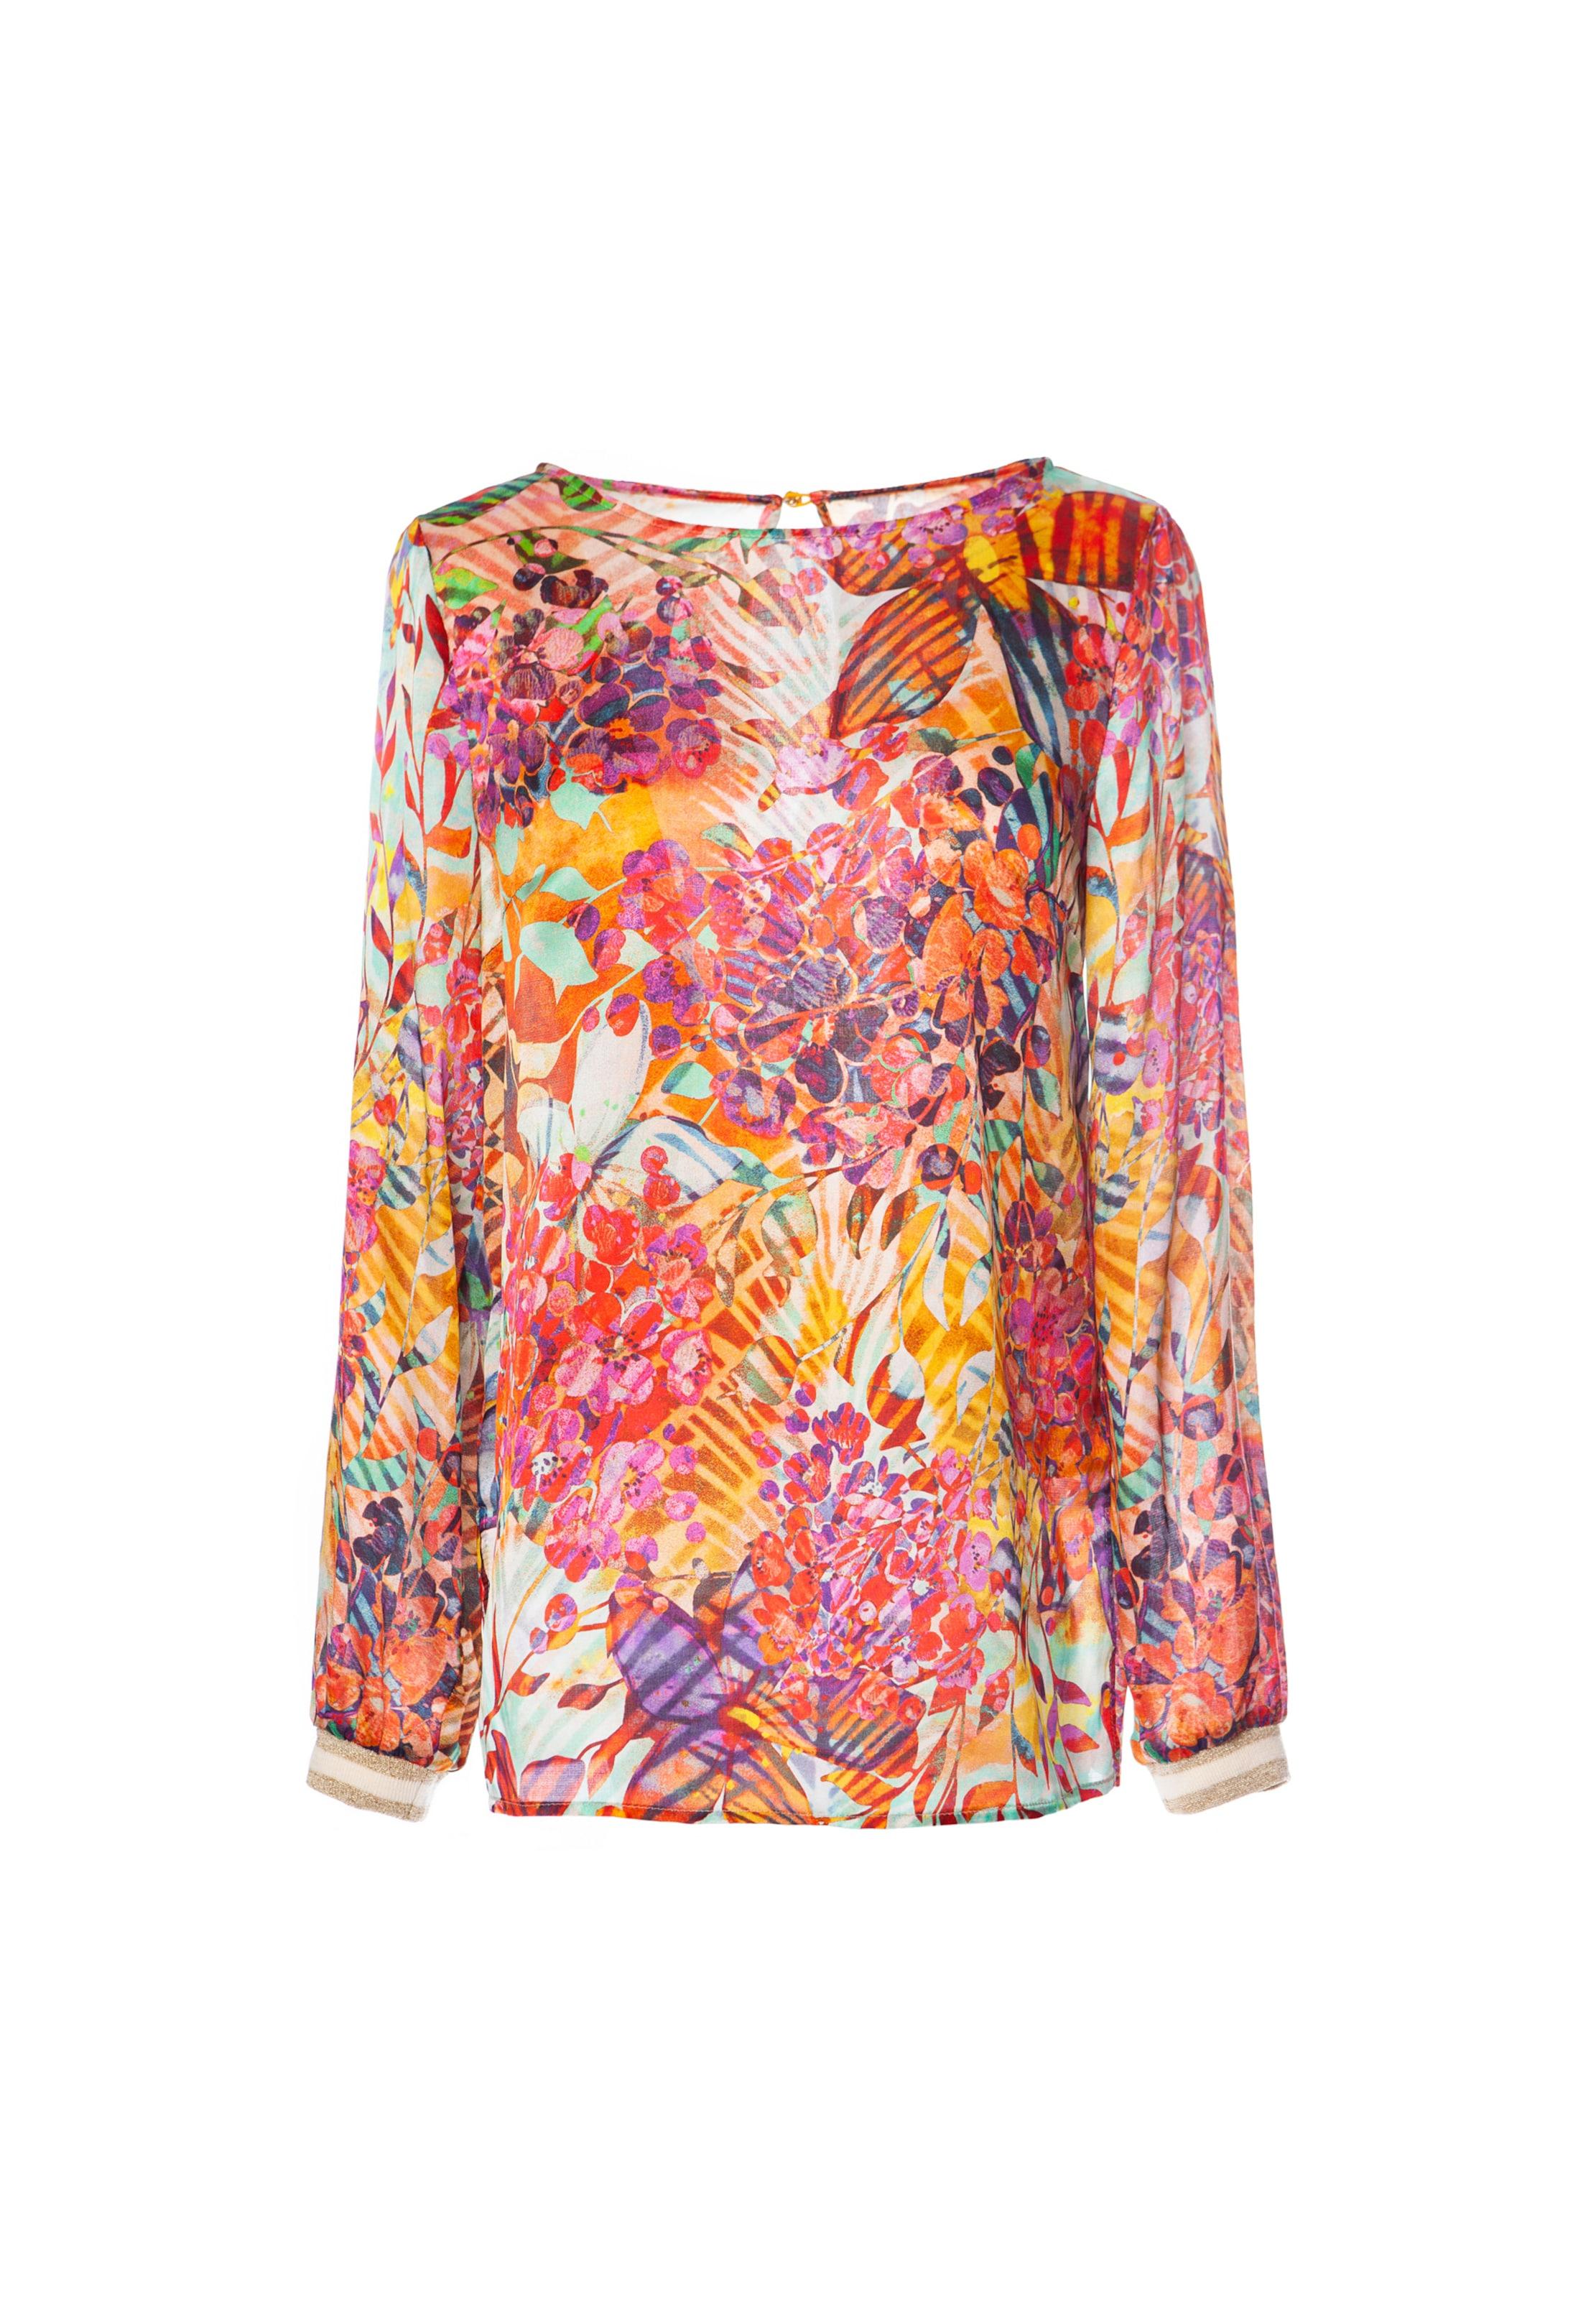 Rouge Violet ClairVert Orange Rose T En Foncé Yours shirt All Bleu wm8nvN0